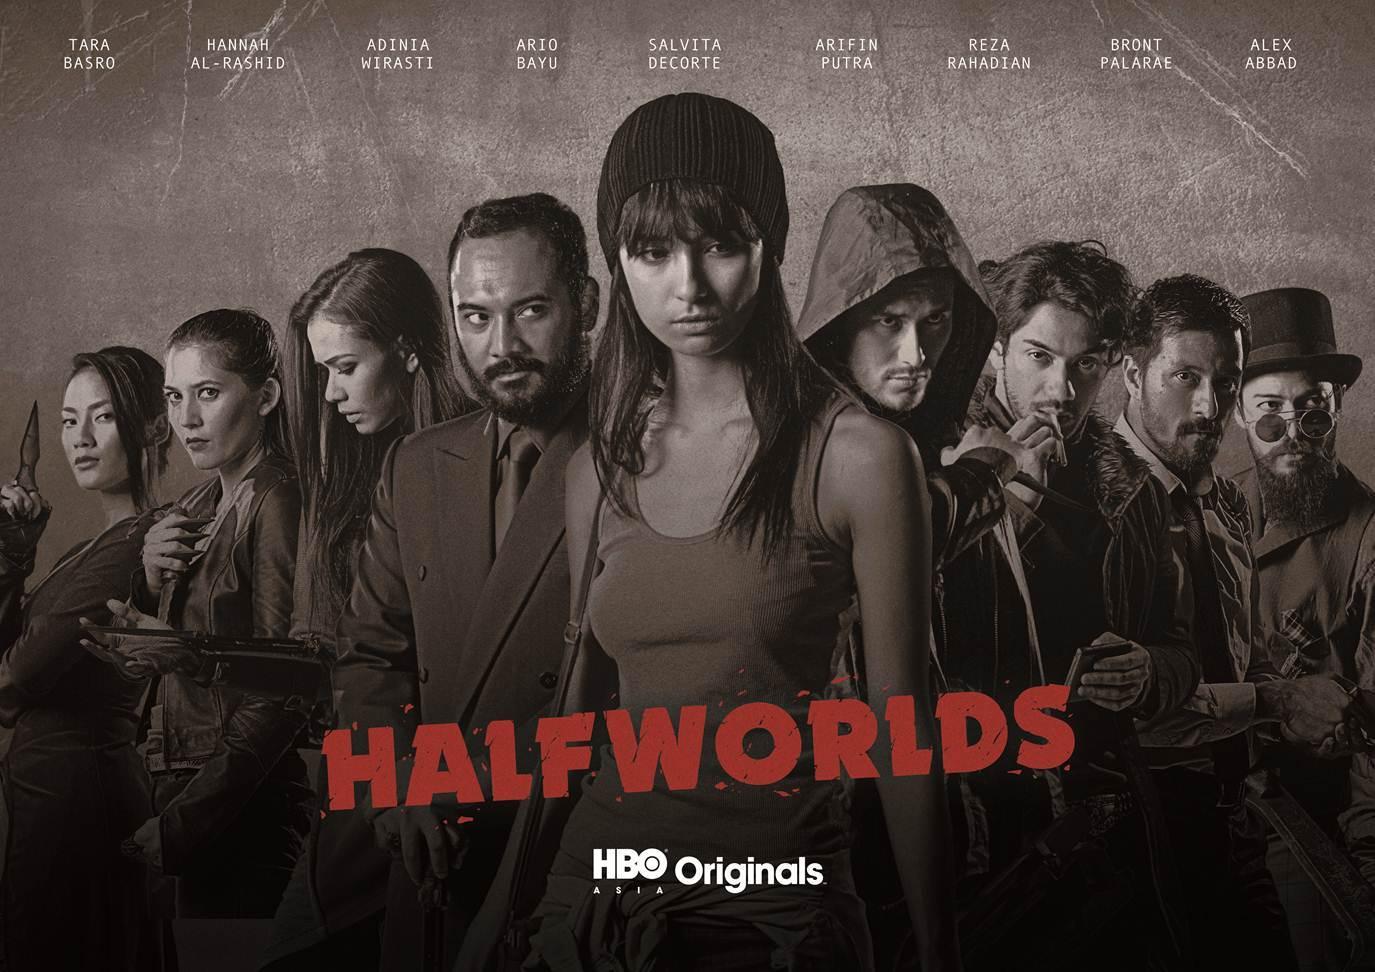 Halfworlds Season 1 (2015)